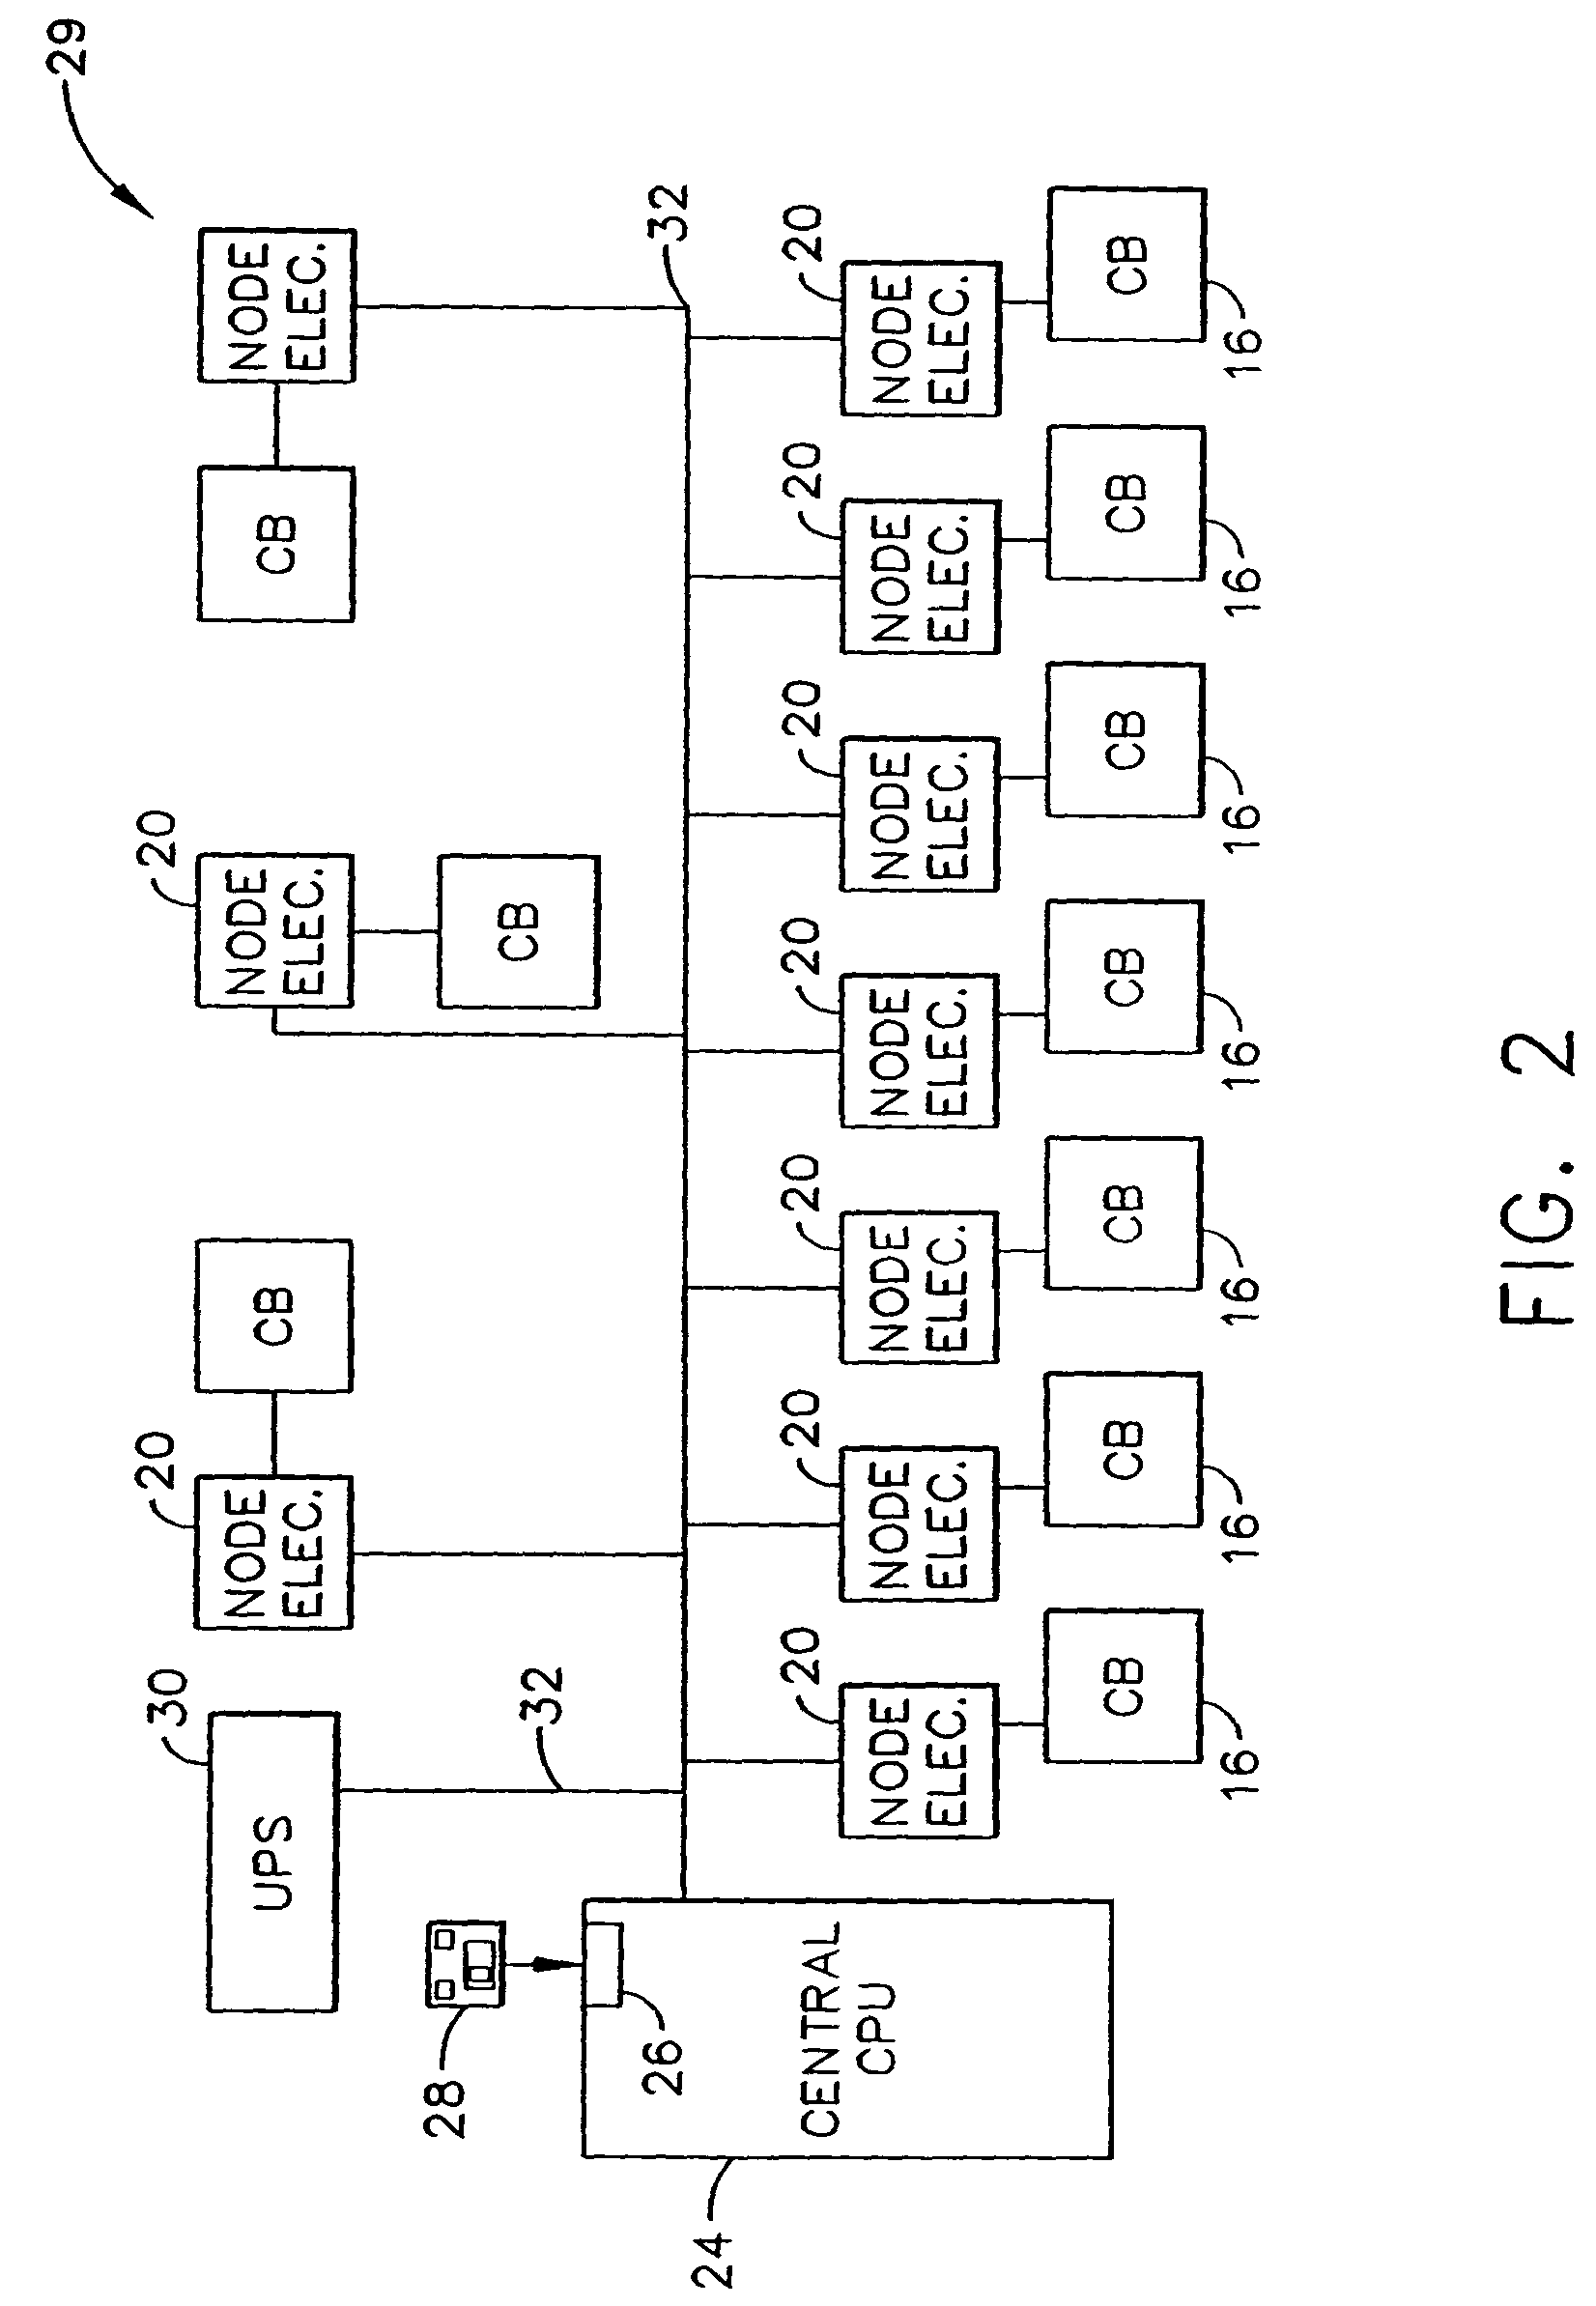 Patent US 7,747,356 B2